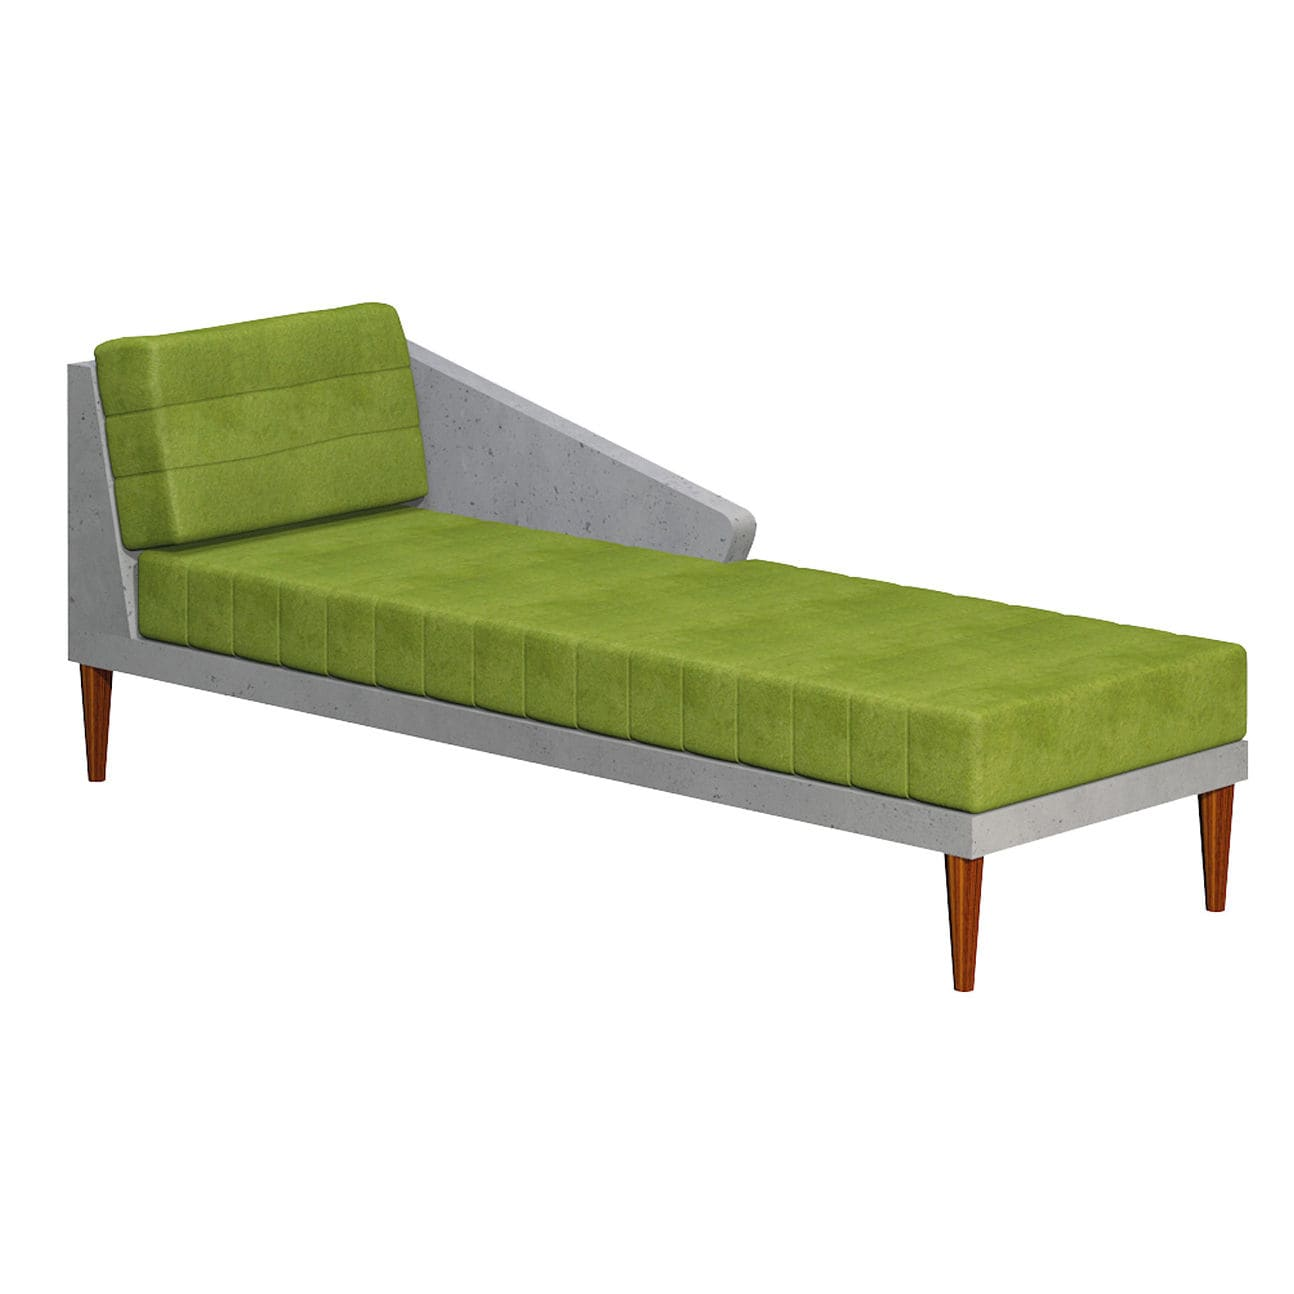 Sensational Contemporary Sun Lounger Fabric Concrete Timeless Ncnpc Chair Design For Home Ncnpcorg